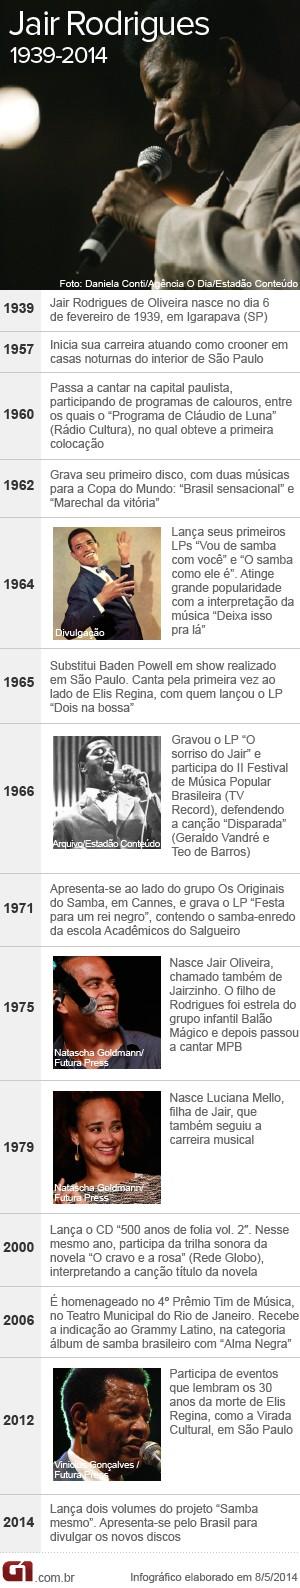 arte cronologia Jair Rodrigues (Foto: Arte G1)